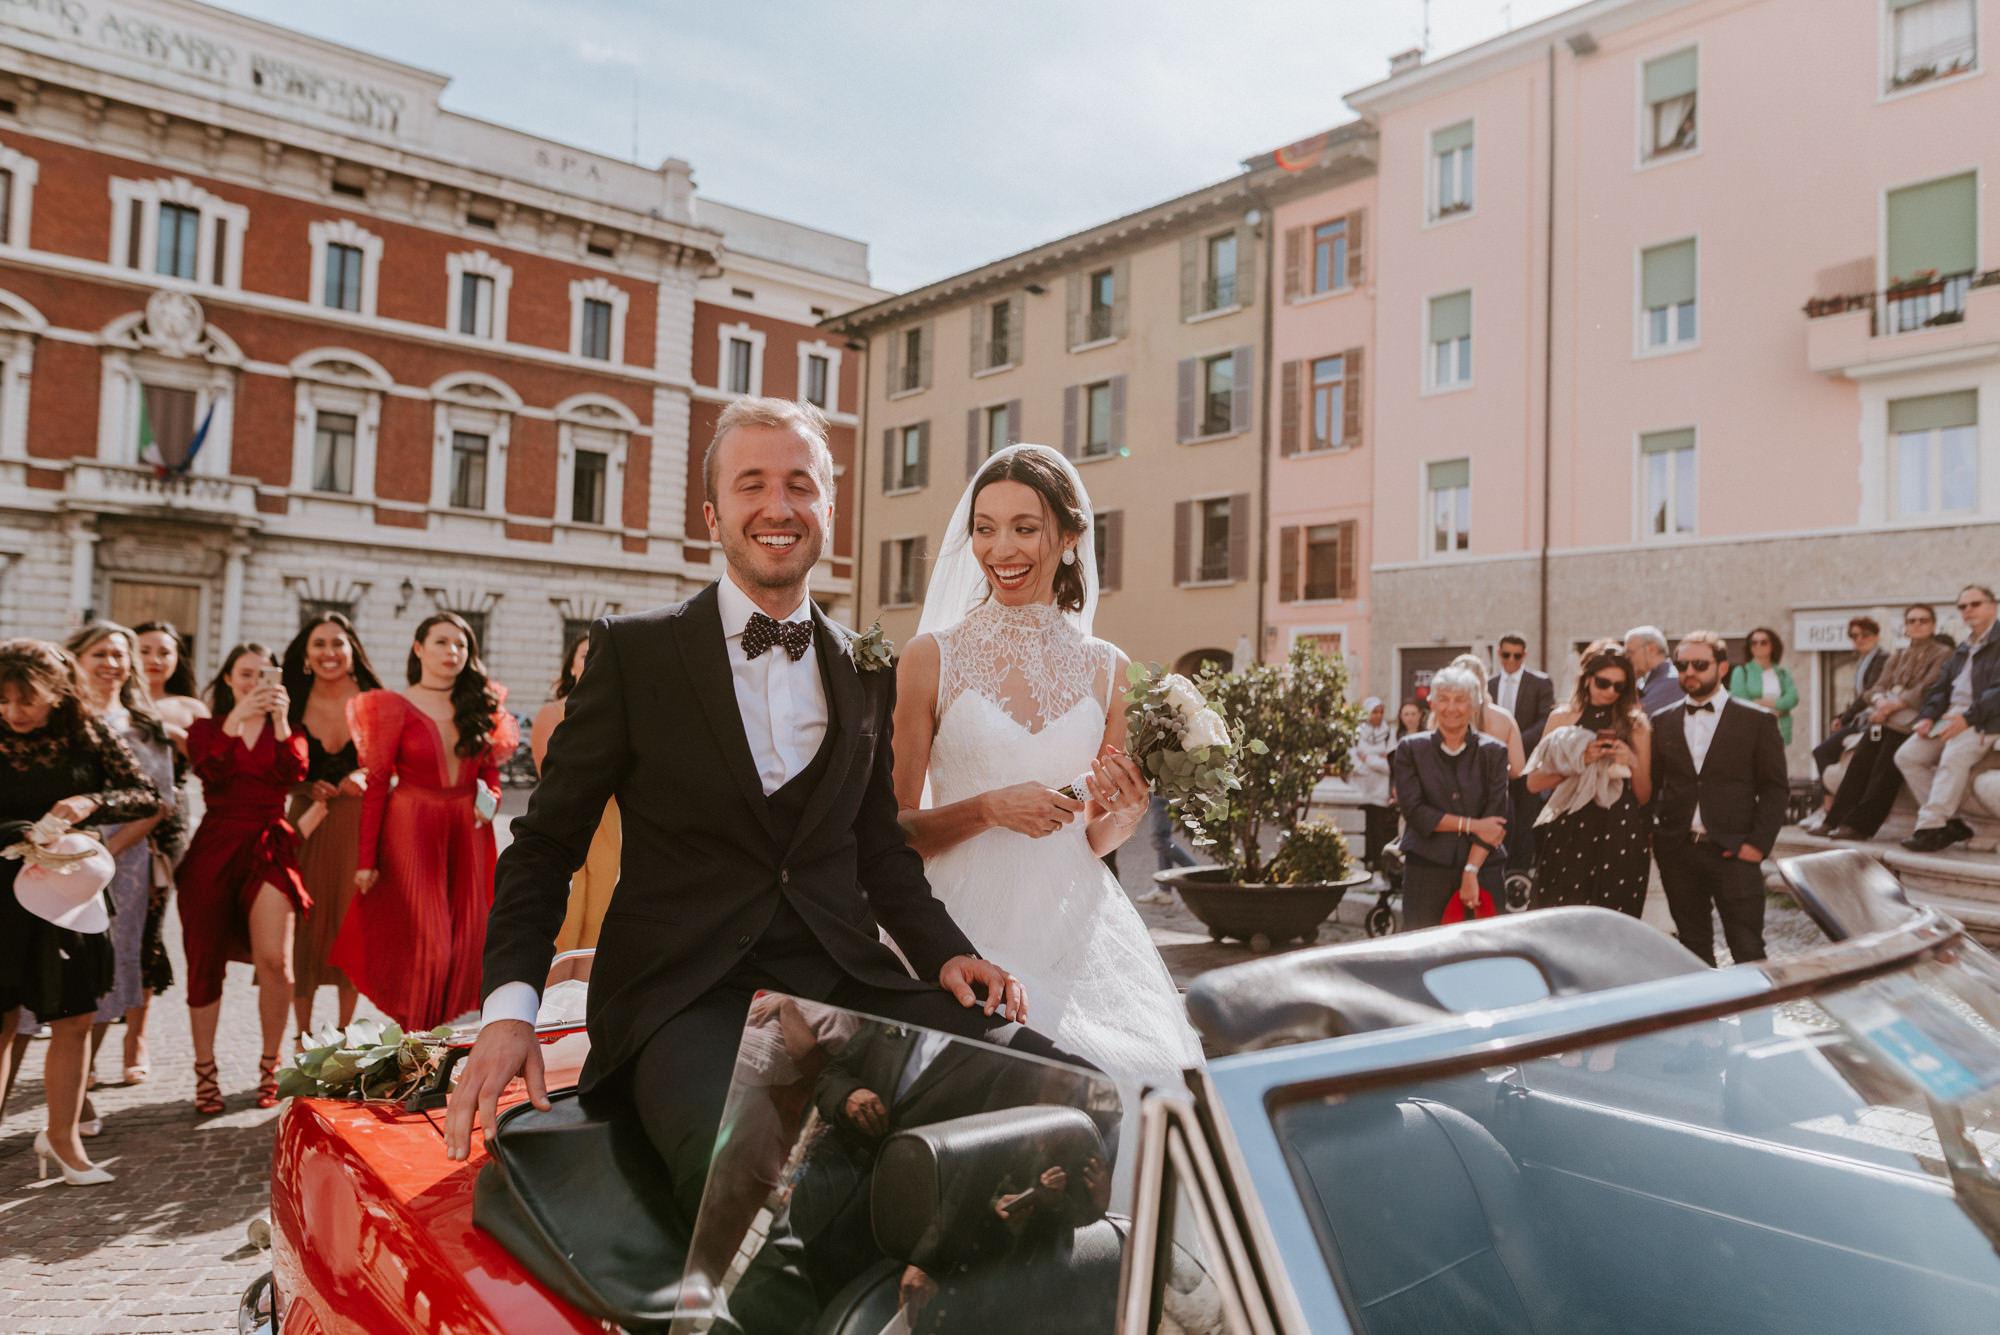 FOTO+PHOTO+BODA+WEDDING+ITALIA+ITALY+MAURICIO+GARAY+MAURICIOGARAY+WEDDINPHOTOGRAPHER+FOTOGRAFODEBODA-1094.jpg